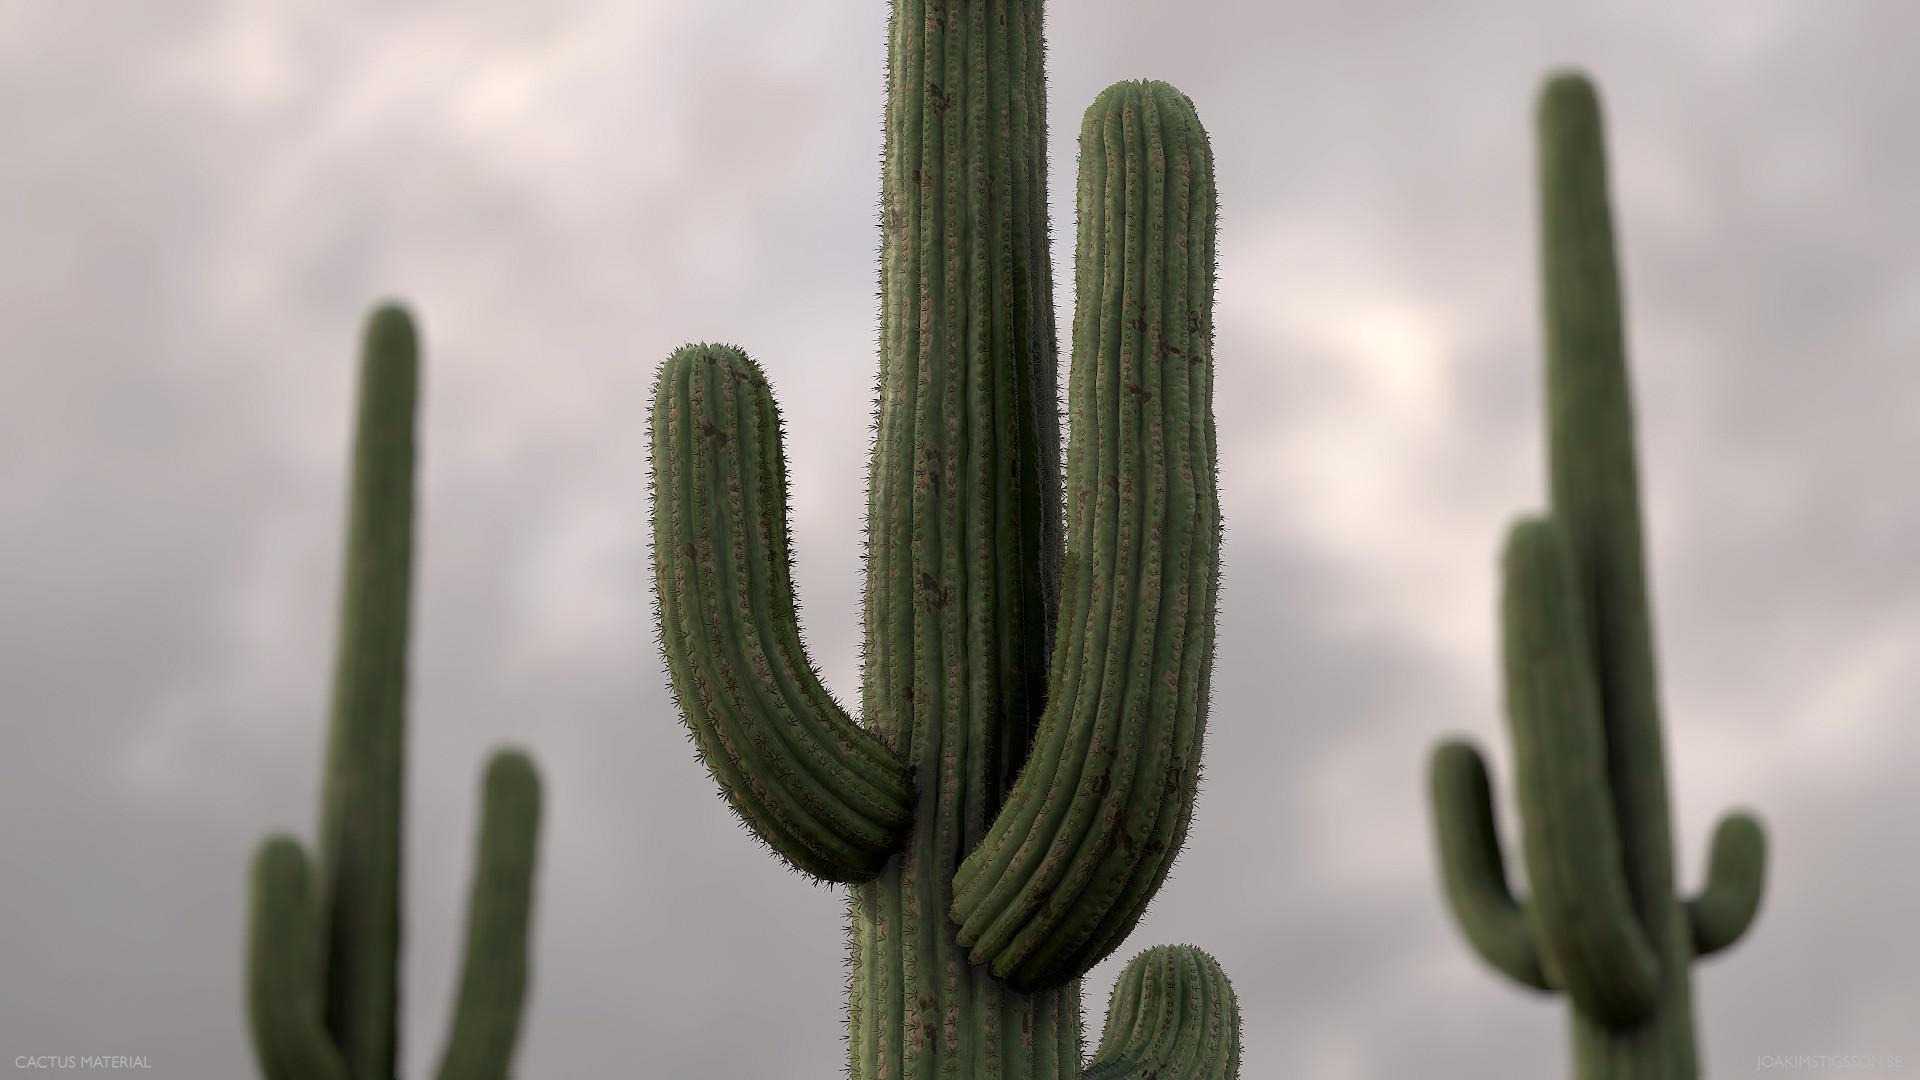 Joakim stigsson cactus 02 model